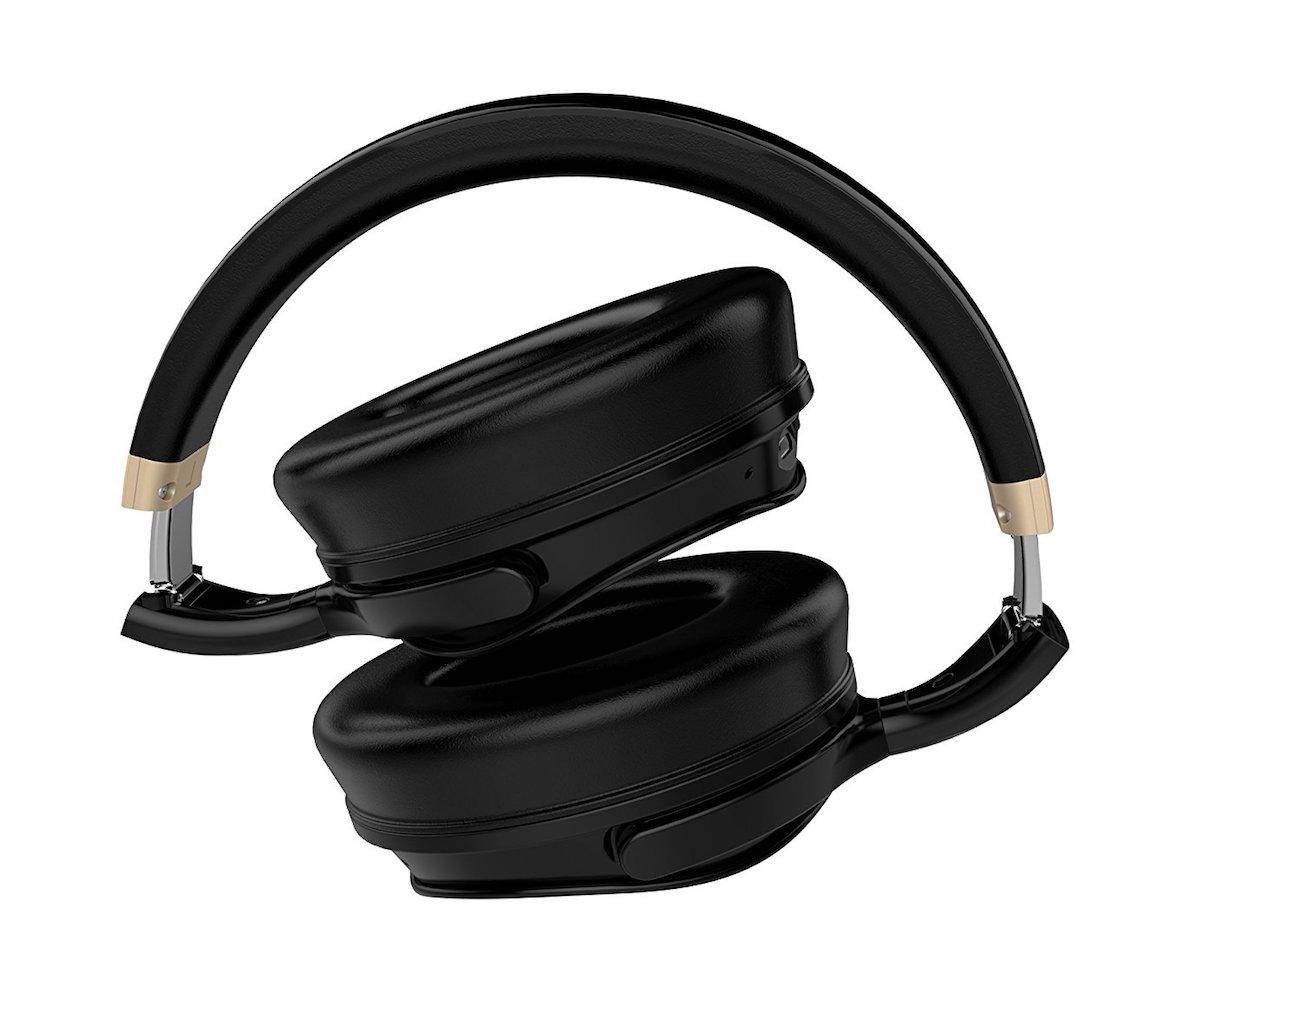 Jabra bluetooth headphones noise cancelling - headphone bluetooth over ear cancelling